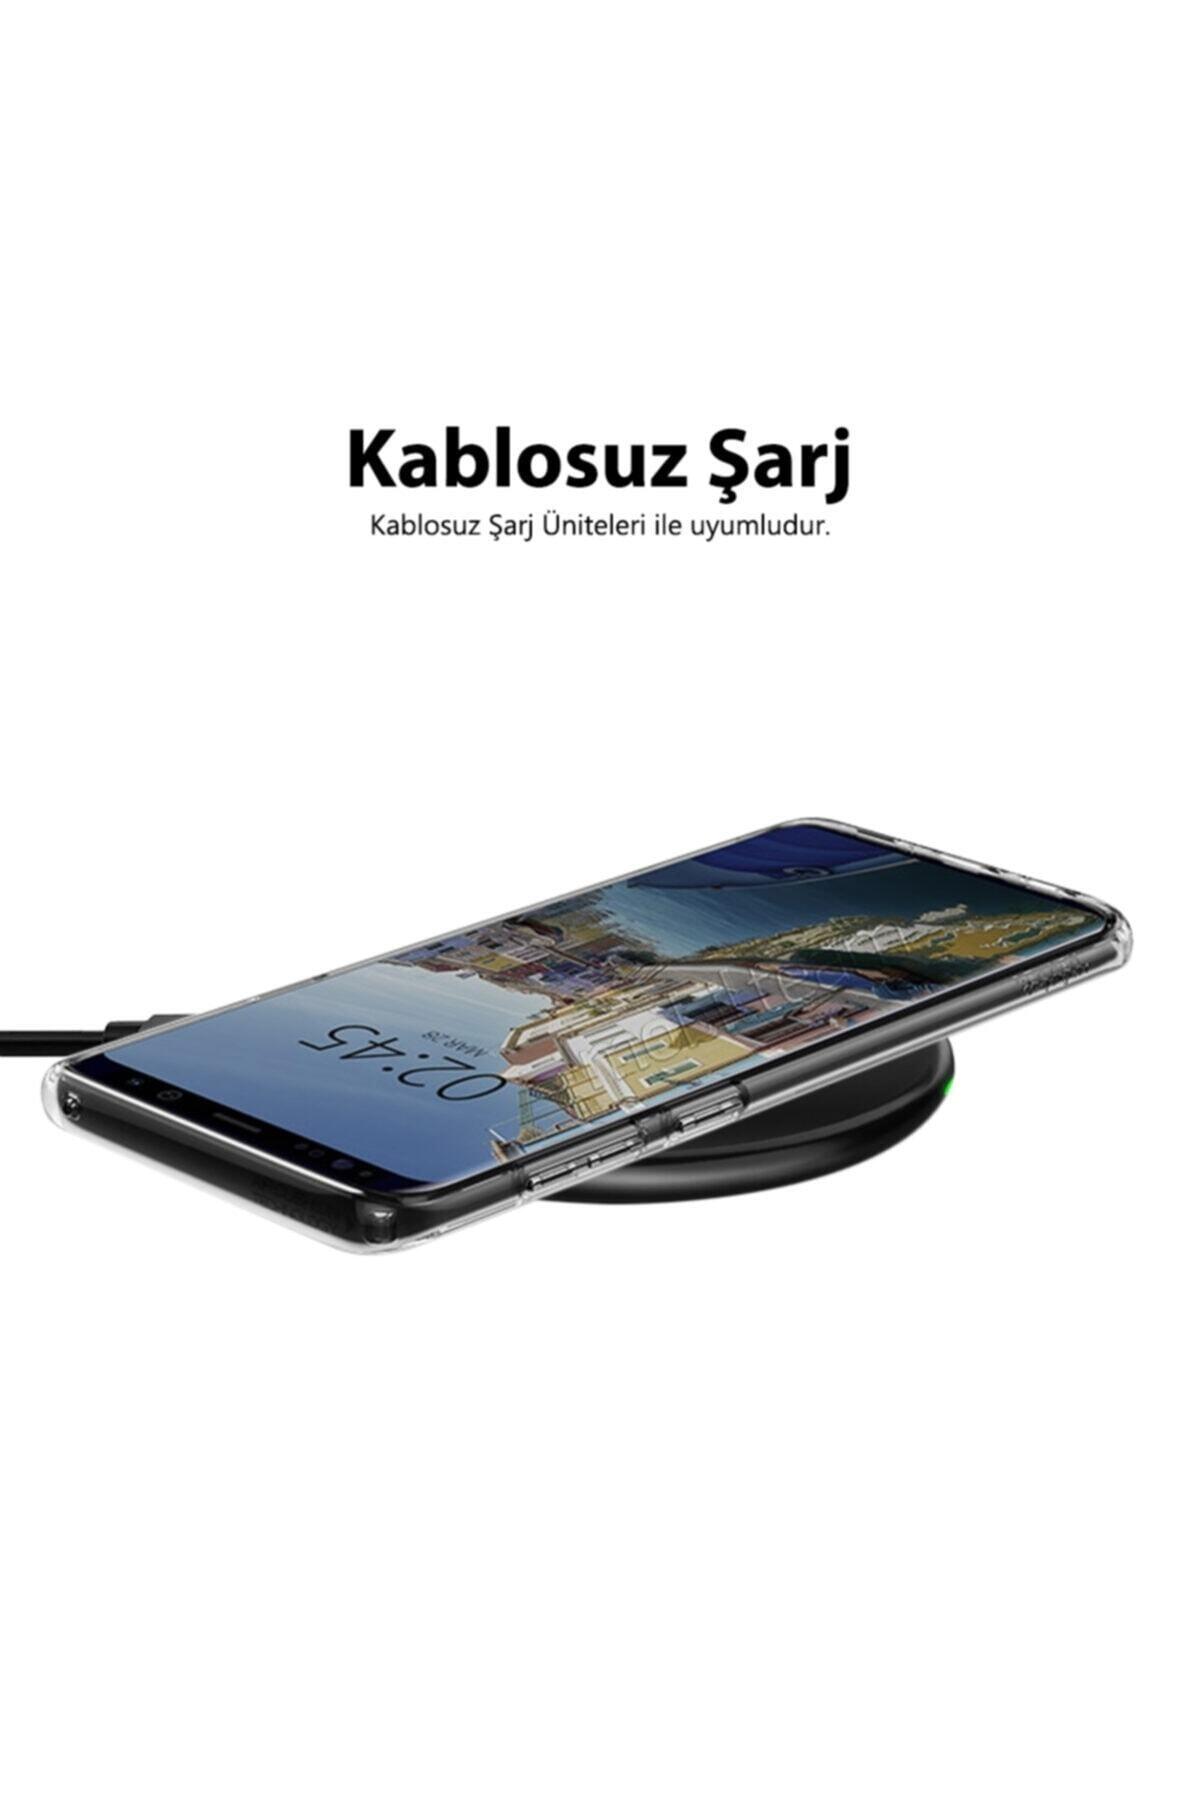 Mobilteam Apple Iphone X Kılıf Şeffaf Süper Silikon Kapak 2